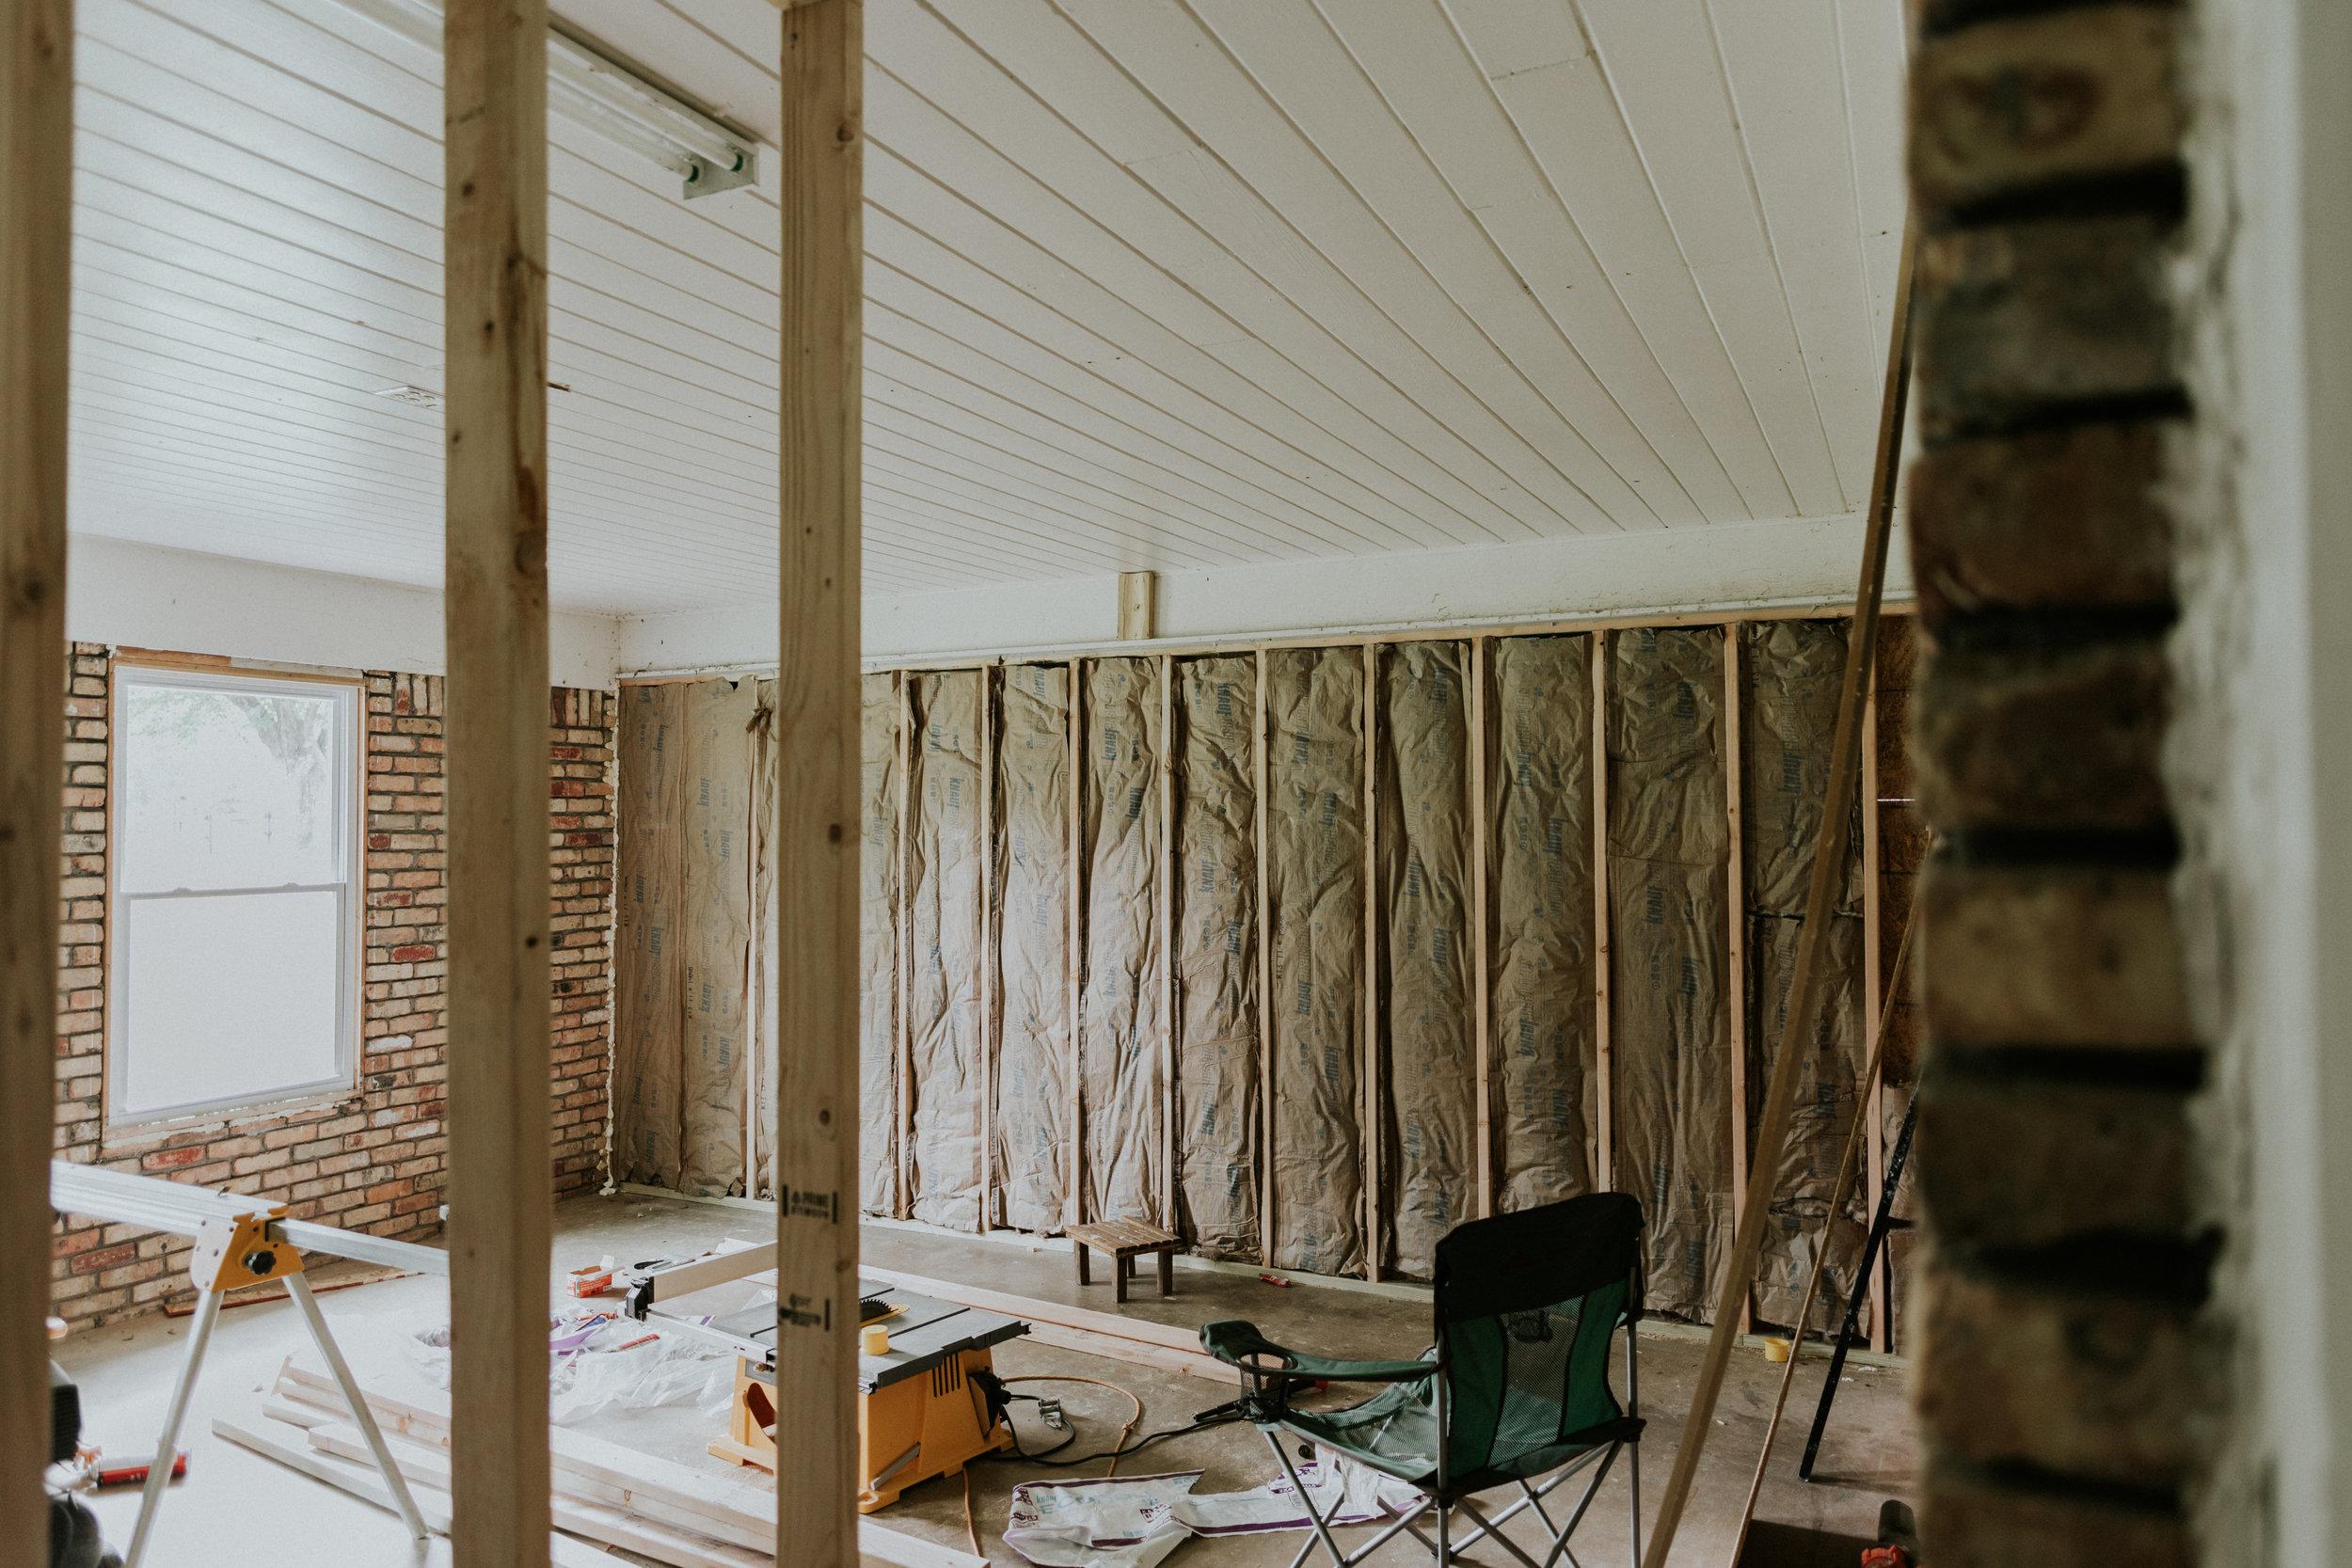 Garage renovation- Building a 'hallway', removing garage door, and enclosing the space